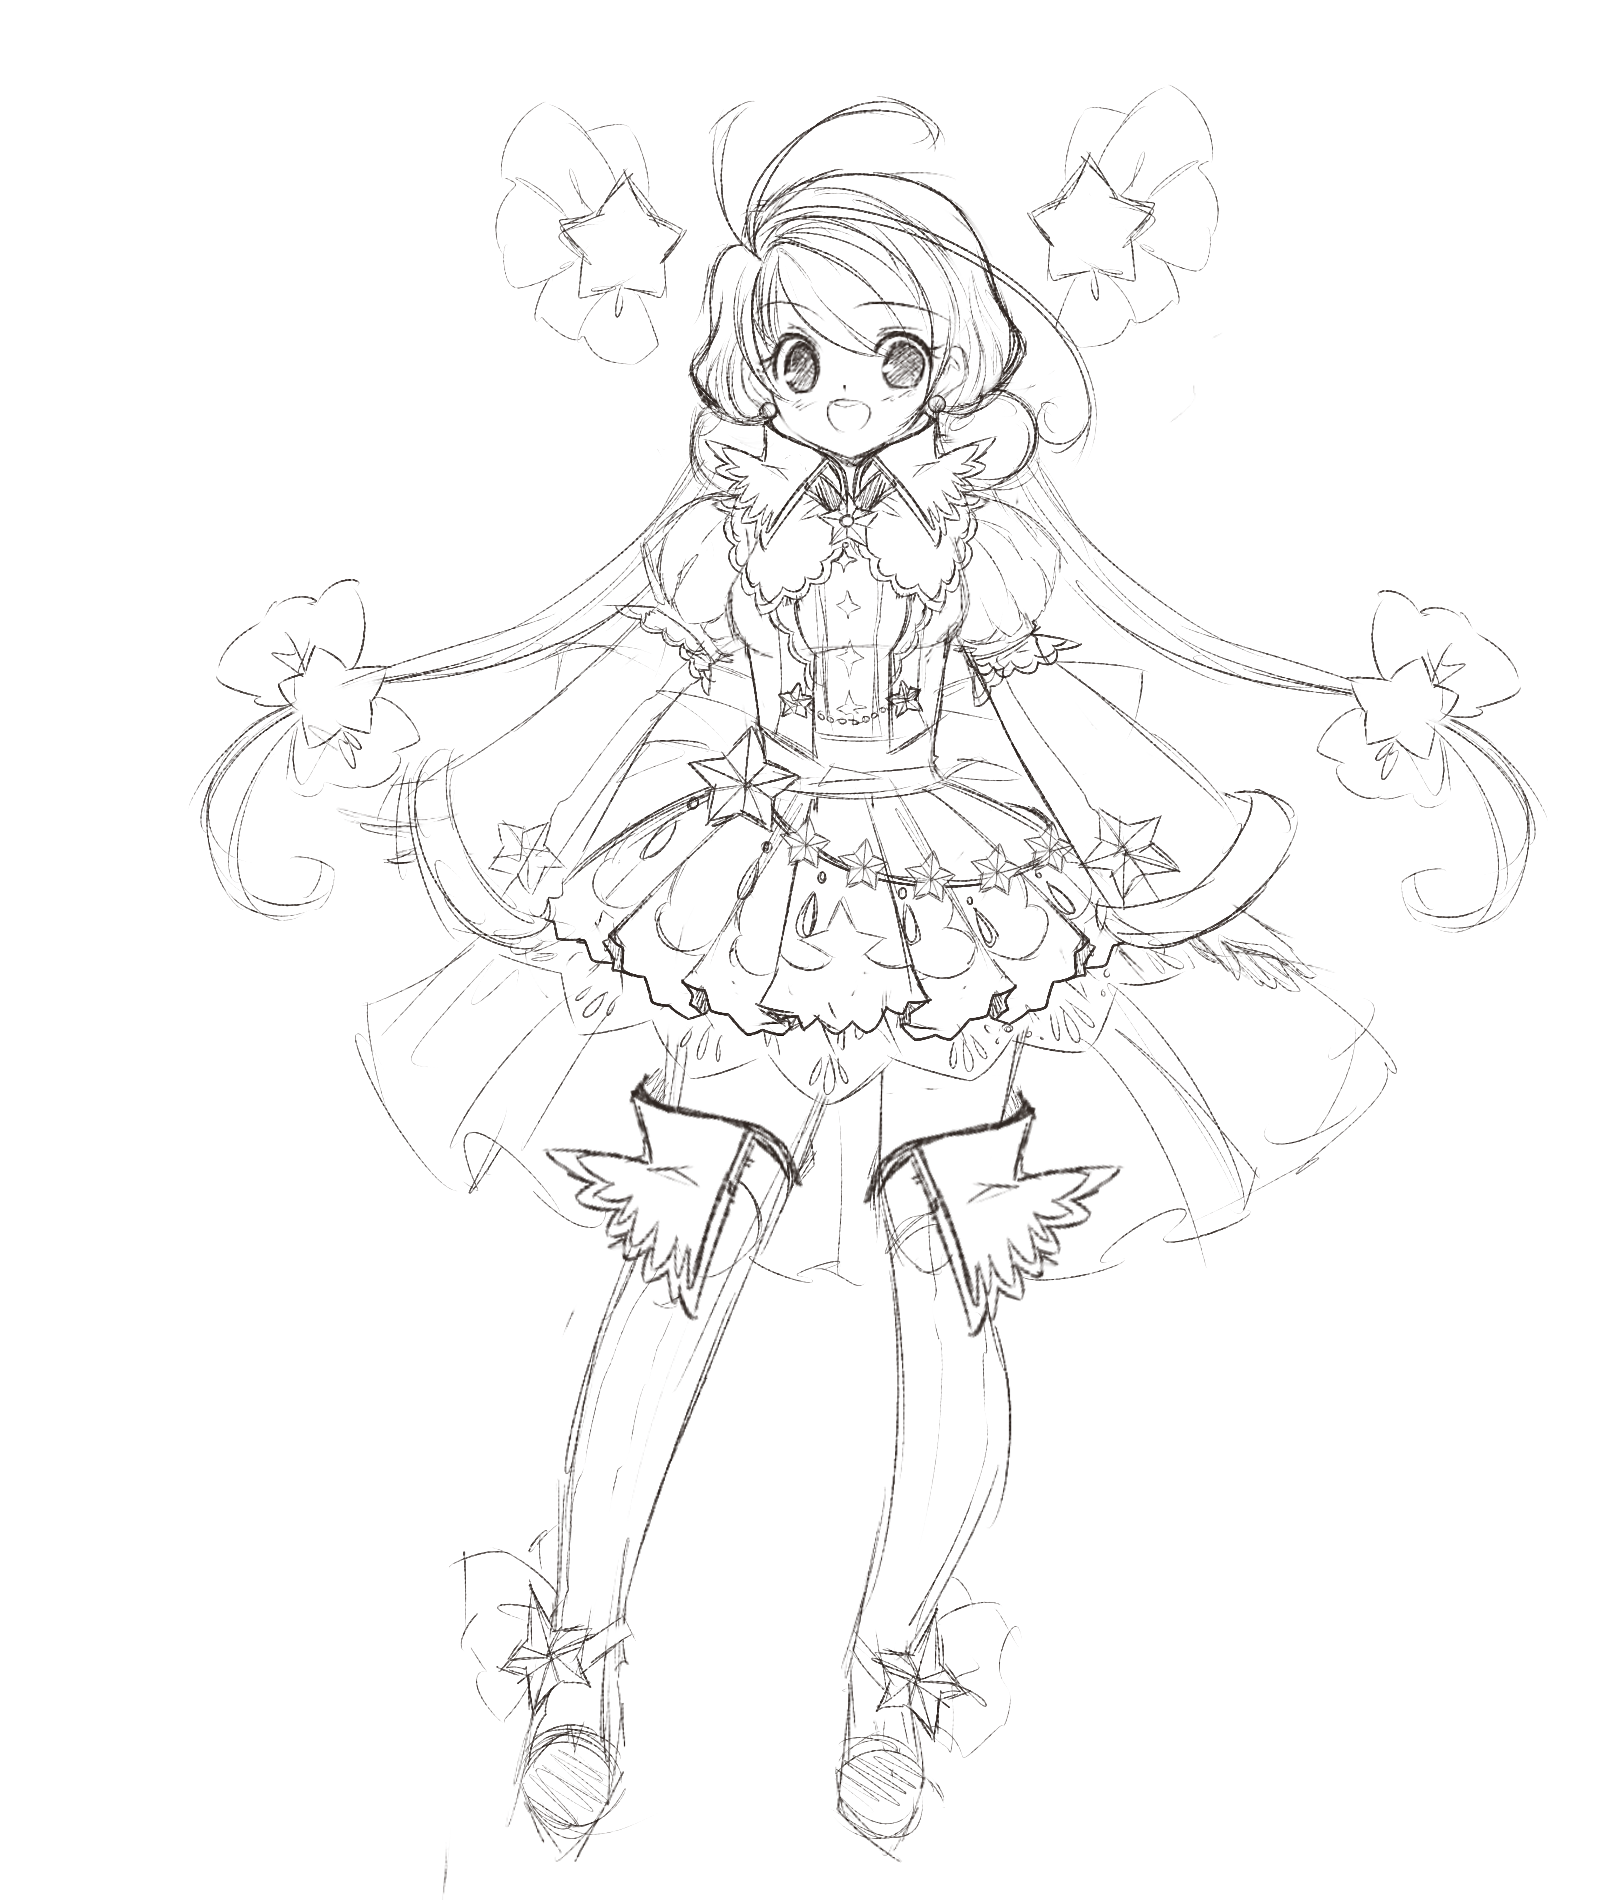 Star princess concept sketch by manouazumi star princess concept sketch by manouazumi